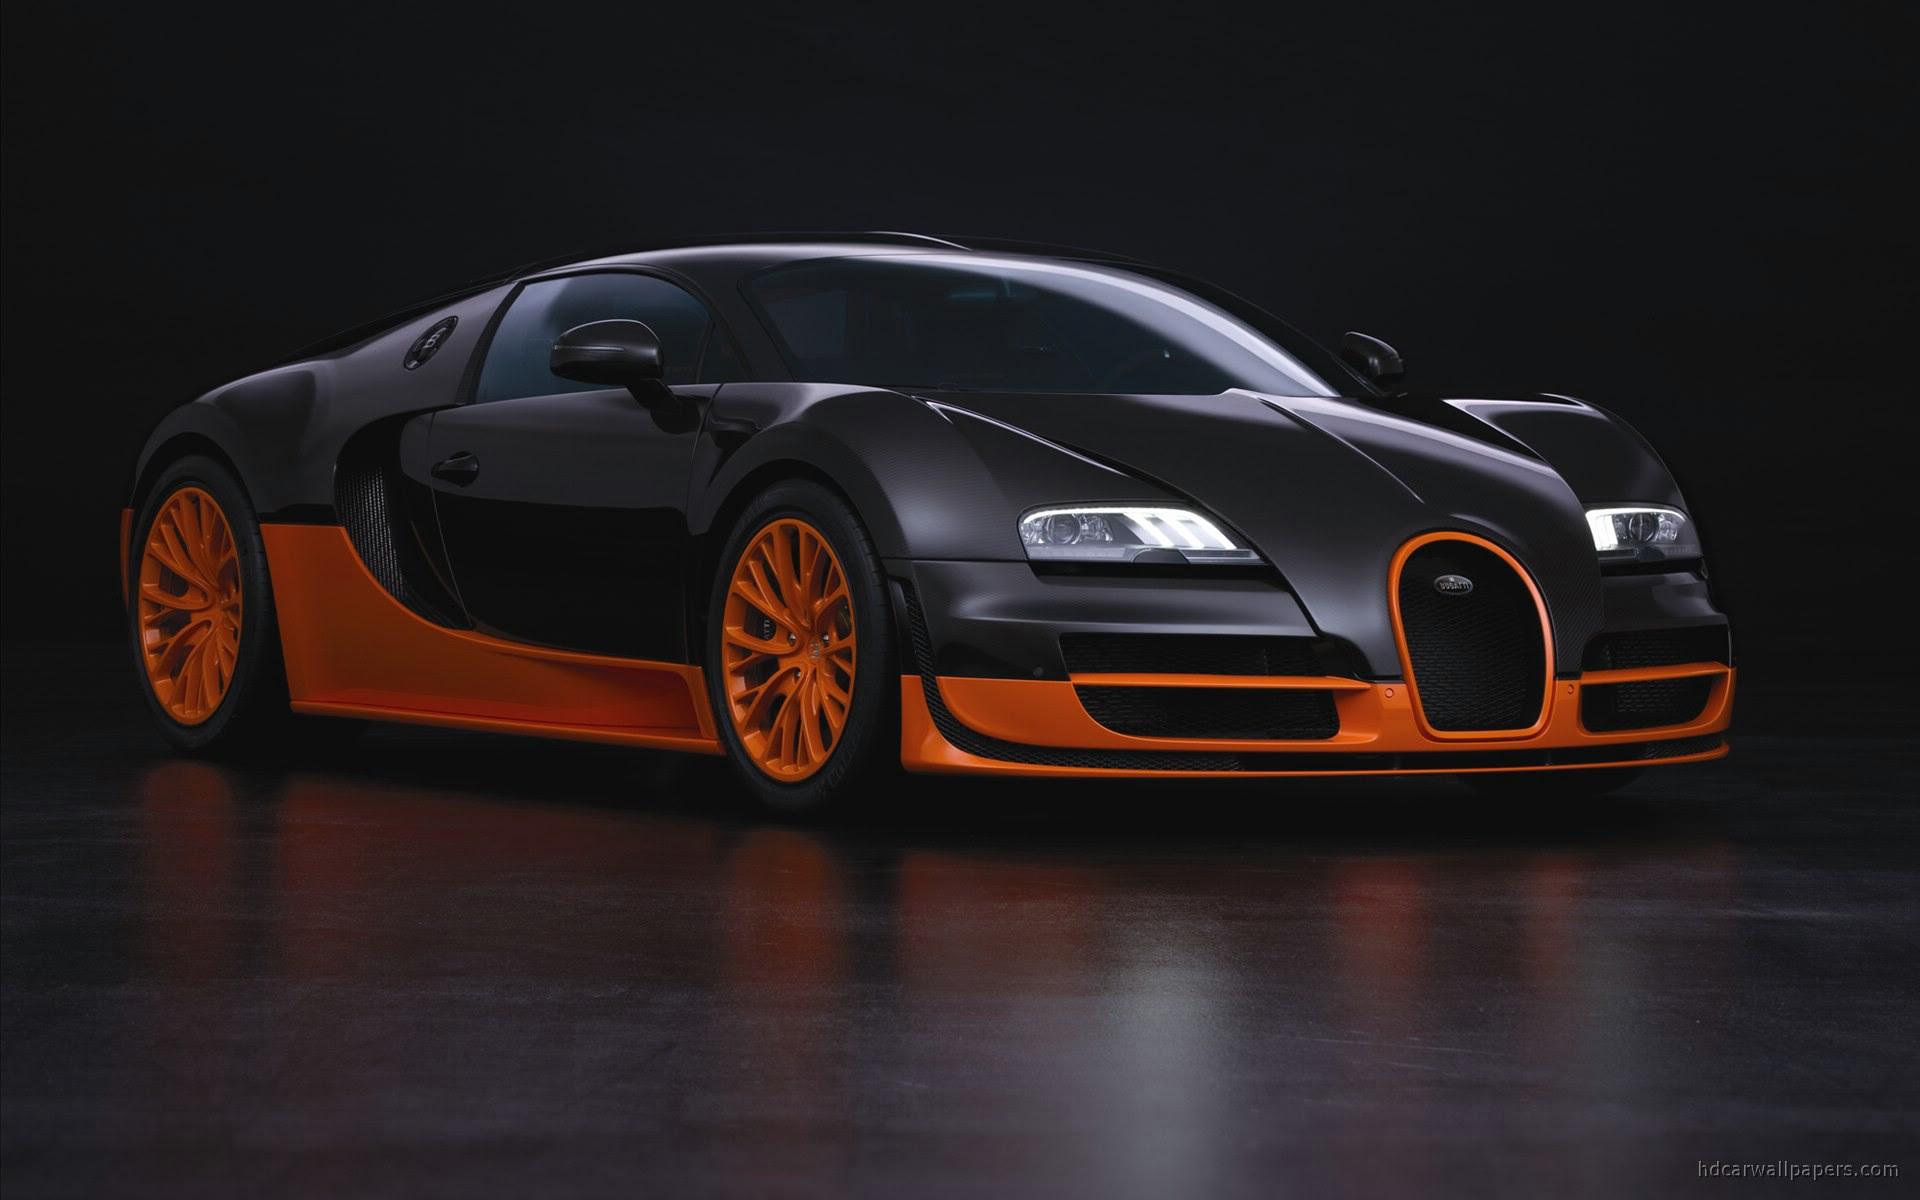 Bugatti Veyron Super Sports Car Wallpaper | HD Car ...